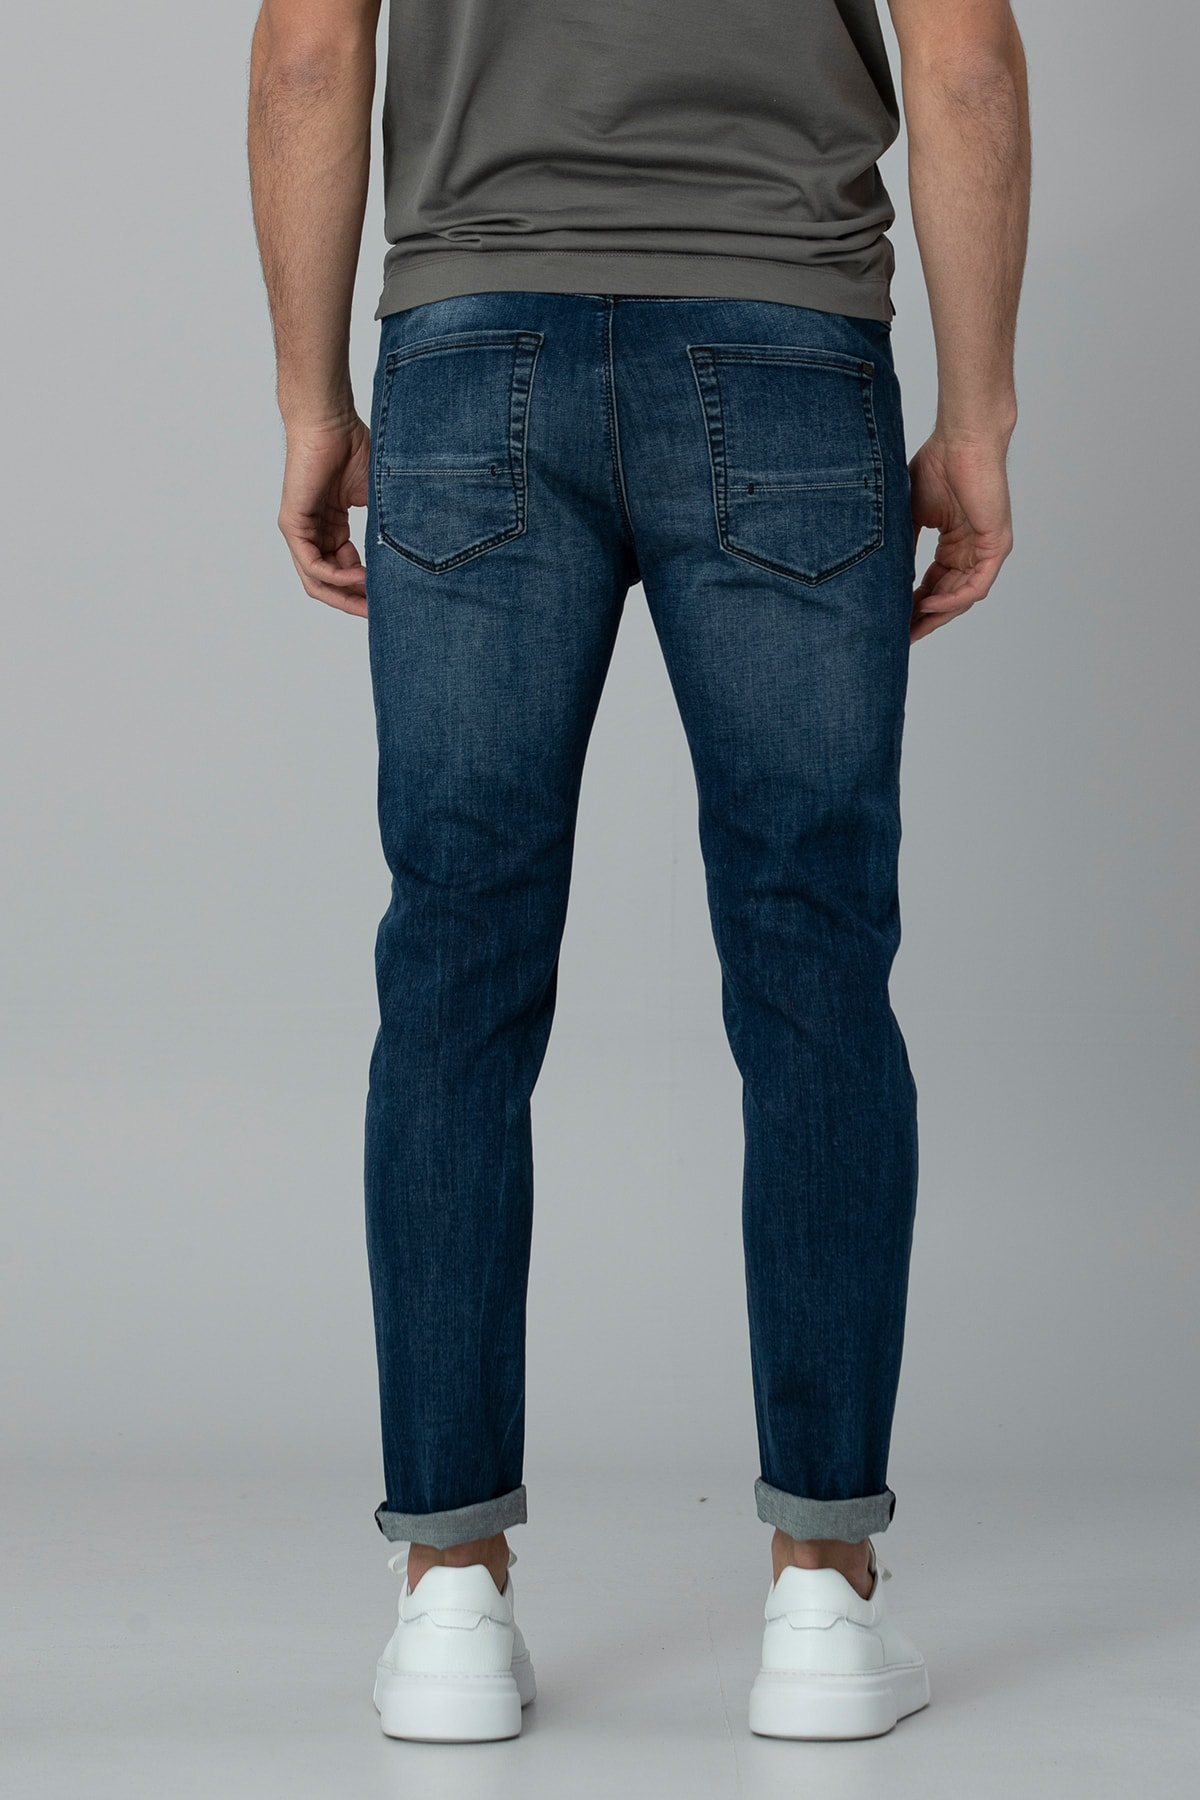 Lufian Aury Smart Jean Pantolon Slim Fit Koyu Mavi 3